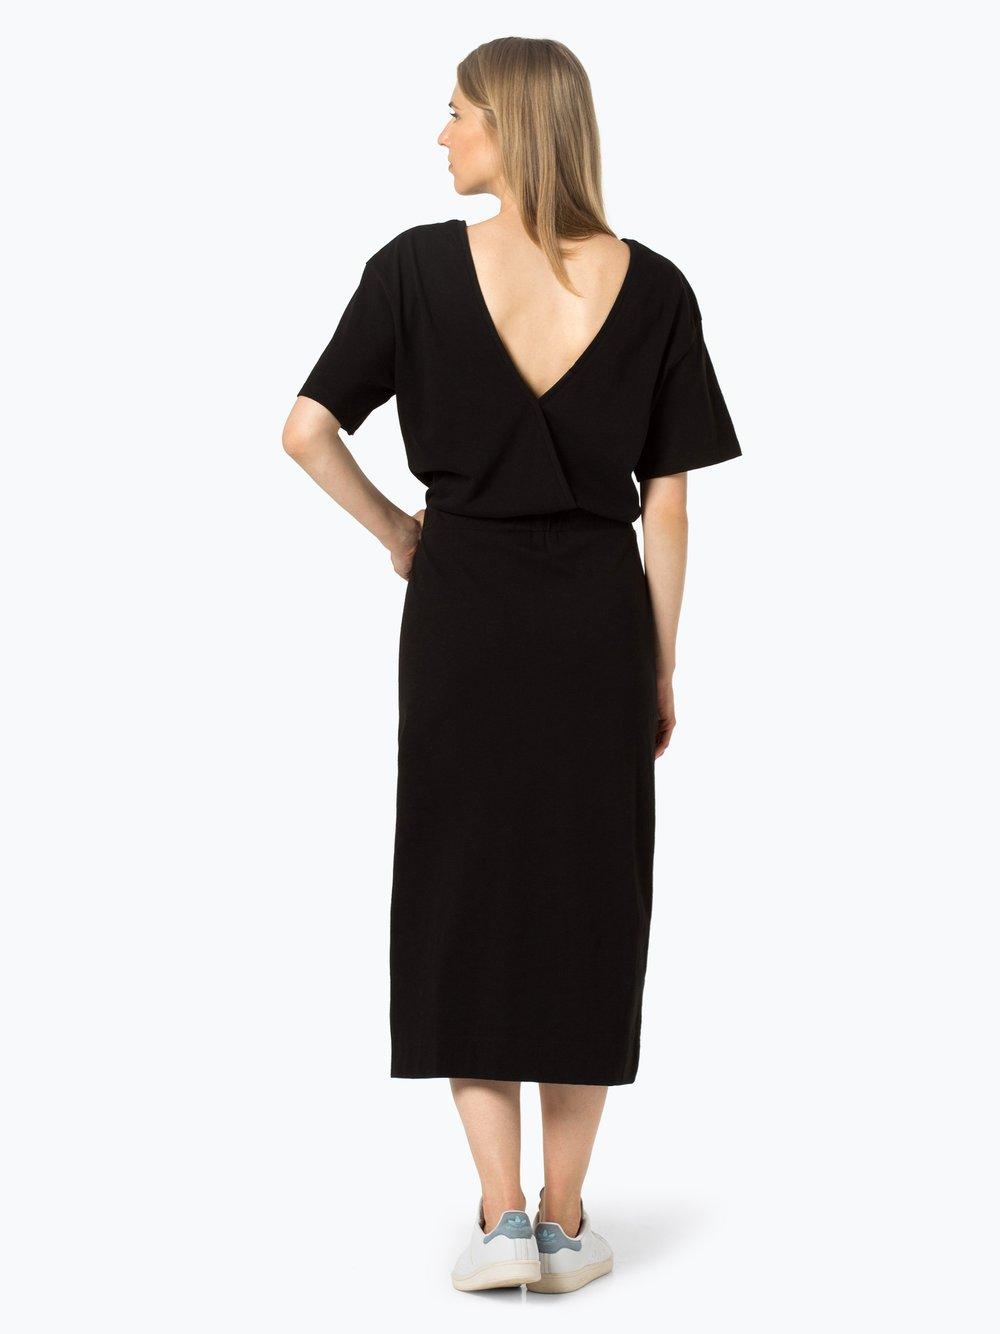 G Star Damen Kleid Bohdana online kaufen | VANGRAAF.COM